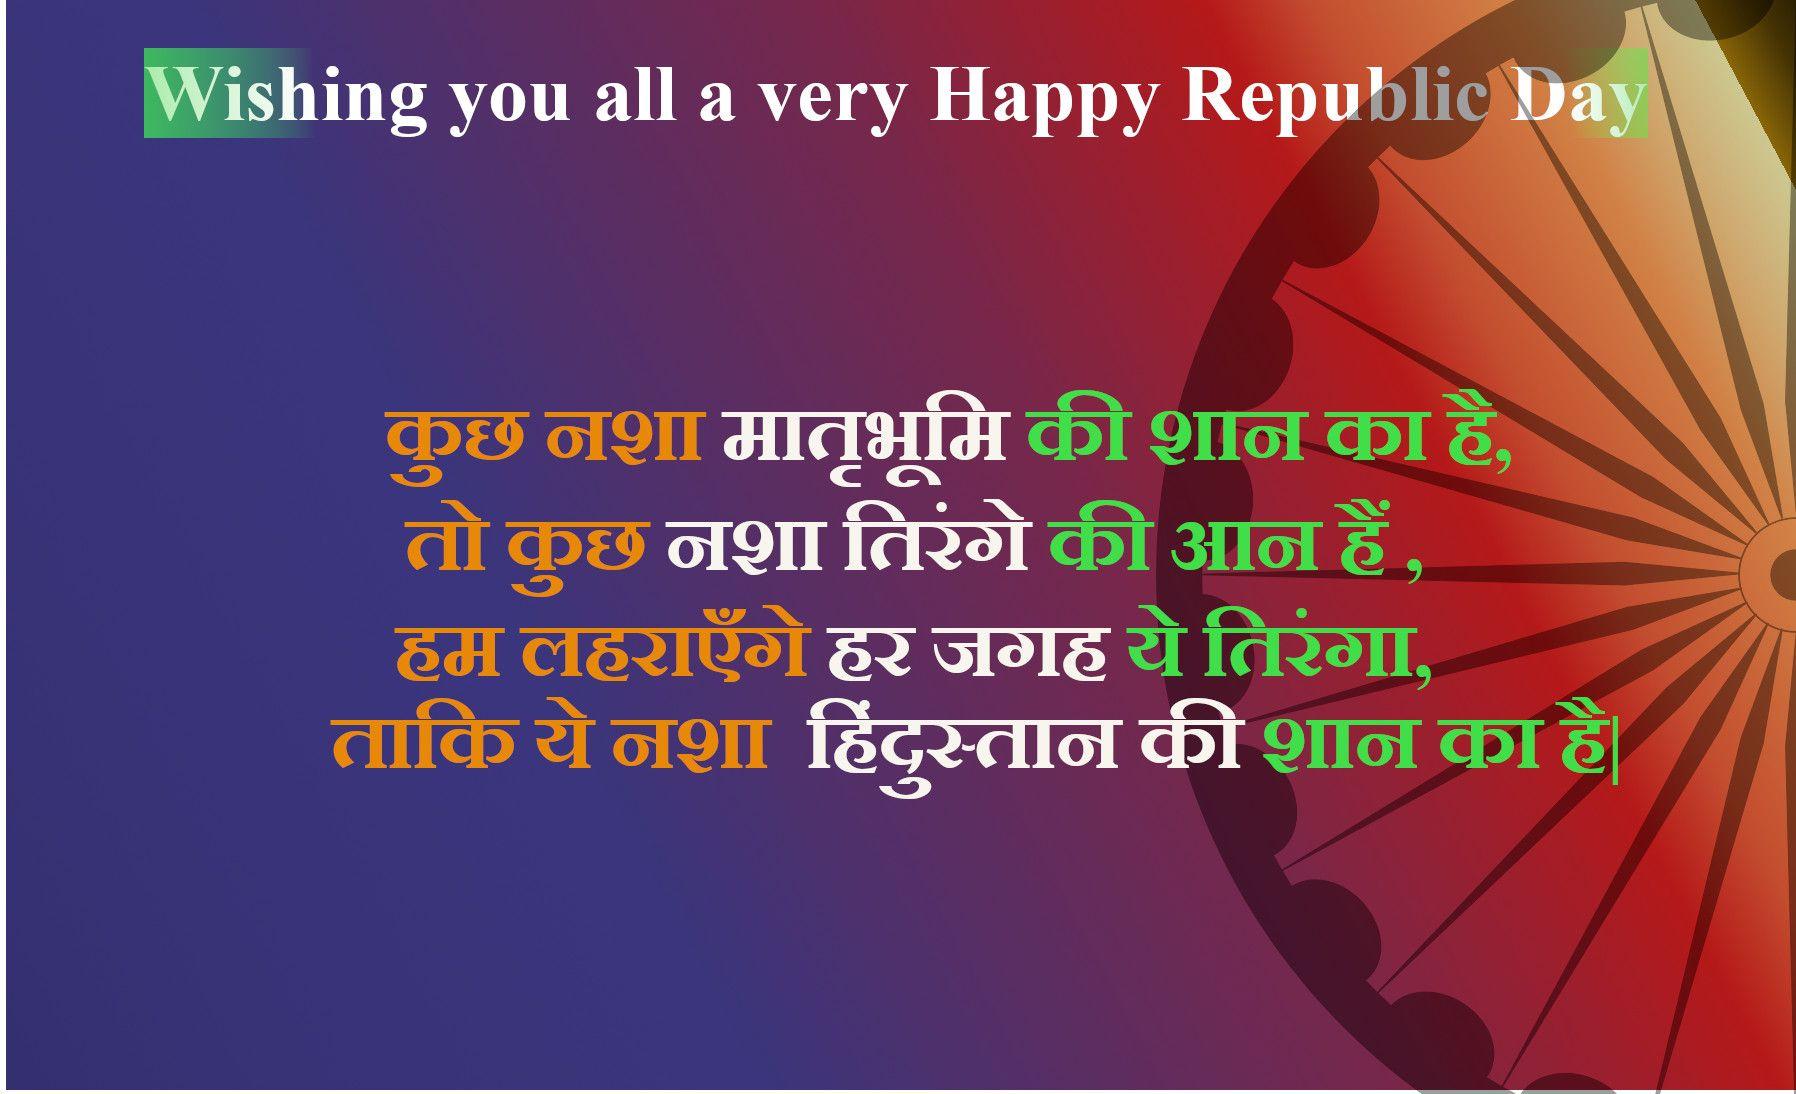 26 Jan Republic Day Image Republic Day Message Republic Day Day Wishes Hindi happy republic day shayari 26